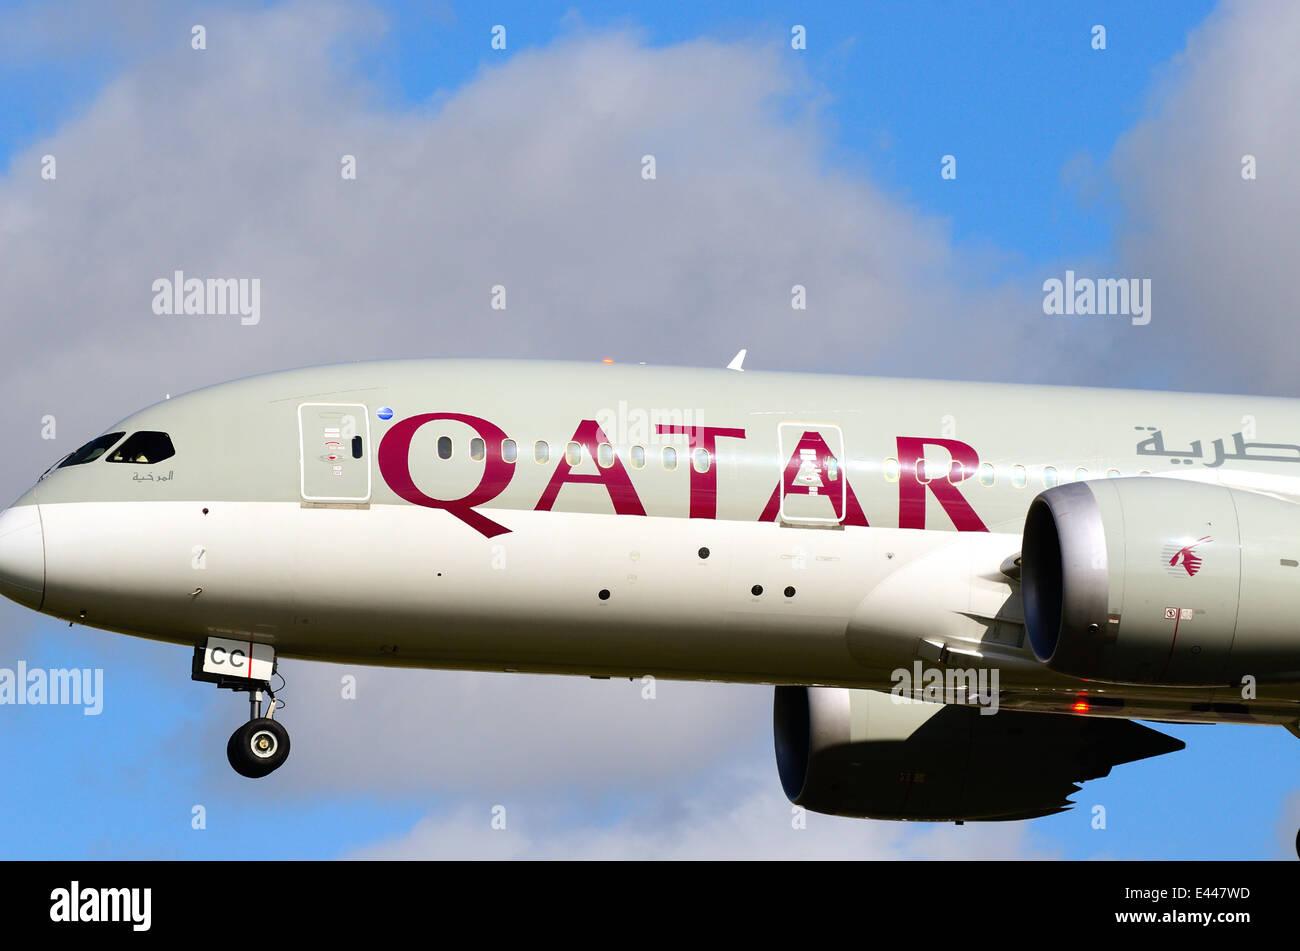 Qatar dreamliner  landing at Heathrow - Stock Image